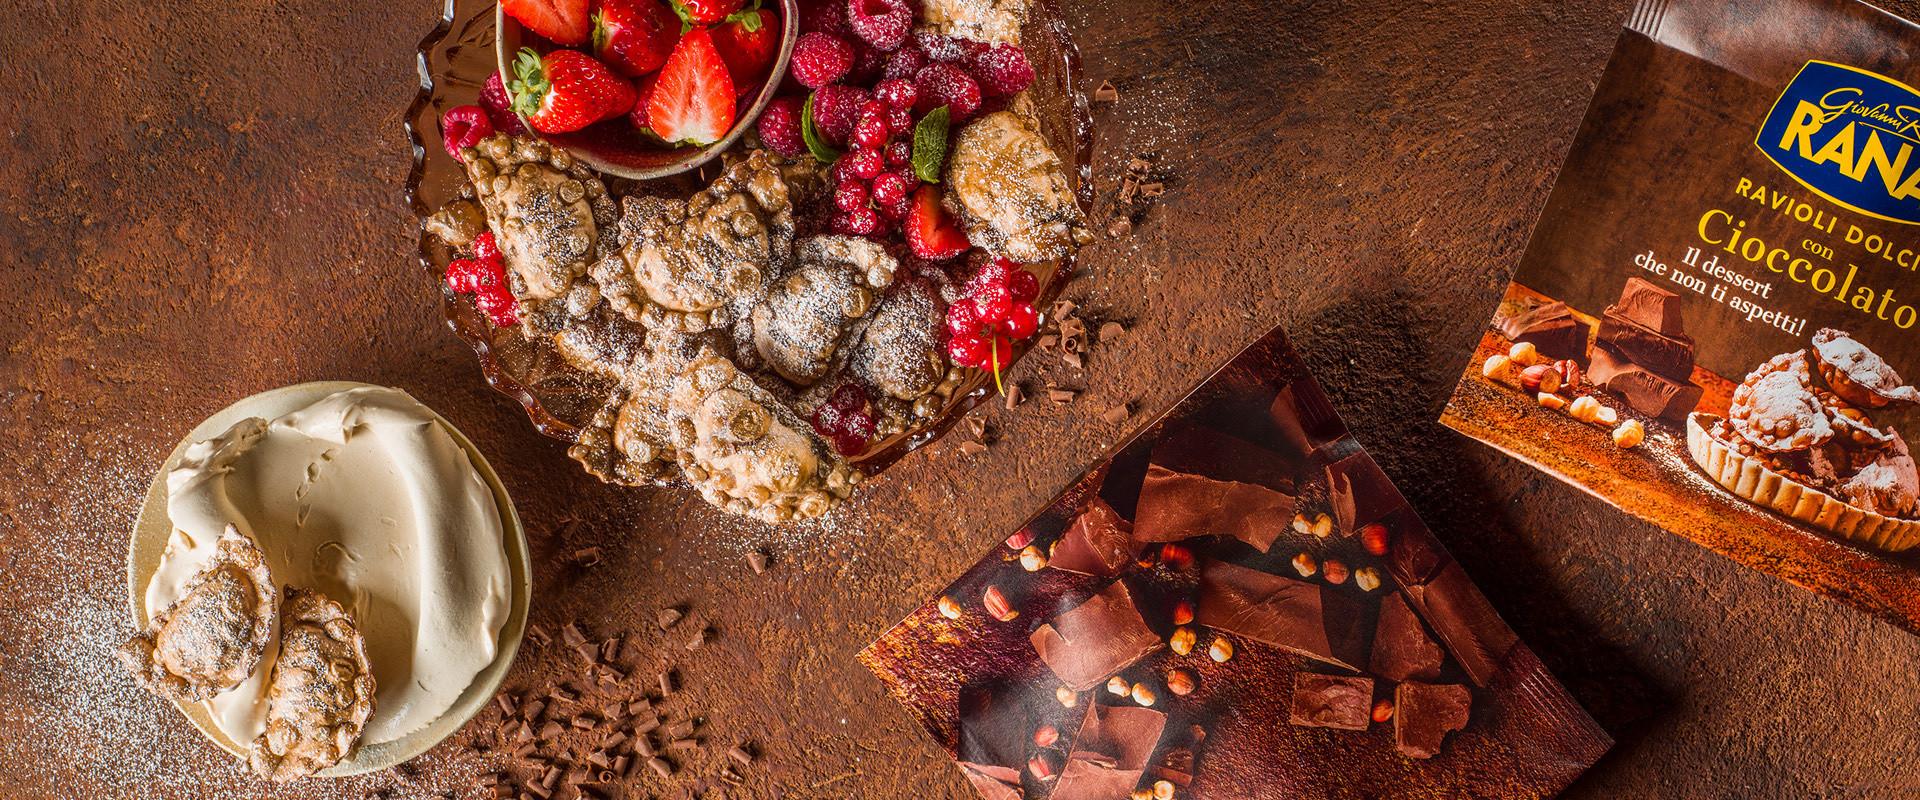 IT-ricette-ravioli-cioccolato-gelato-fruttirossi-D.jpg